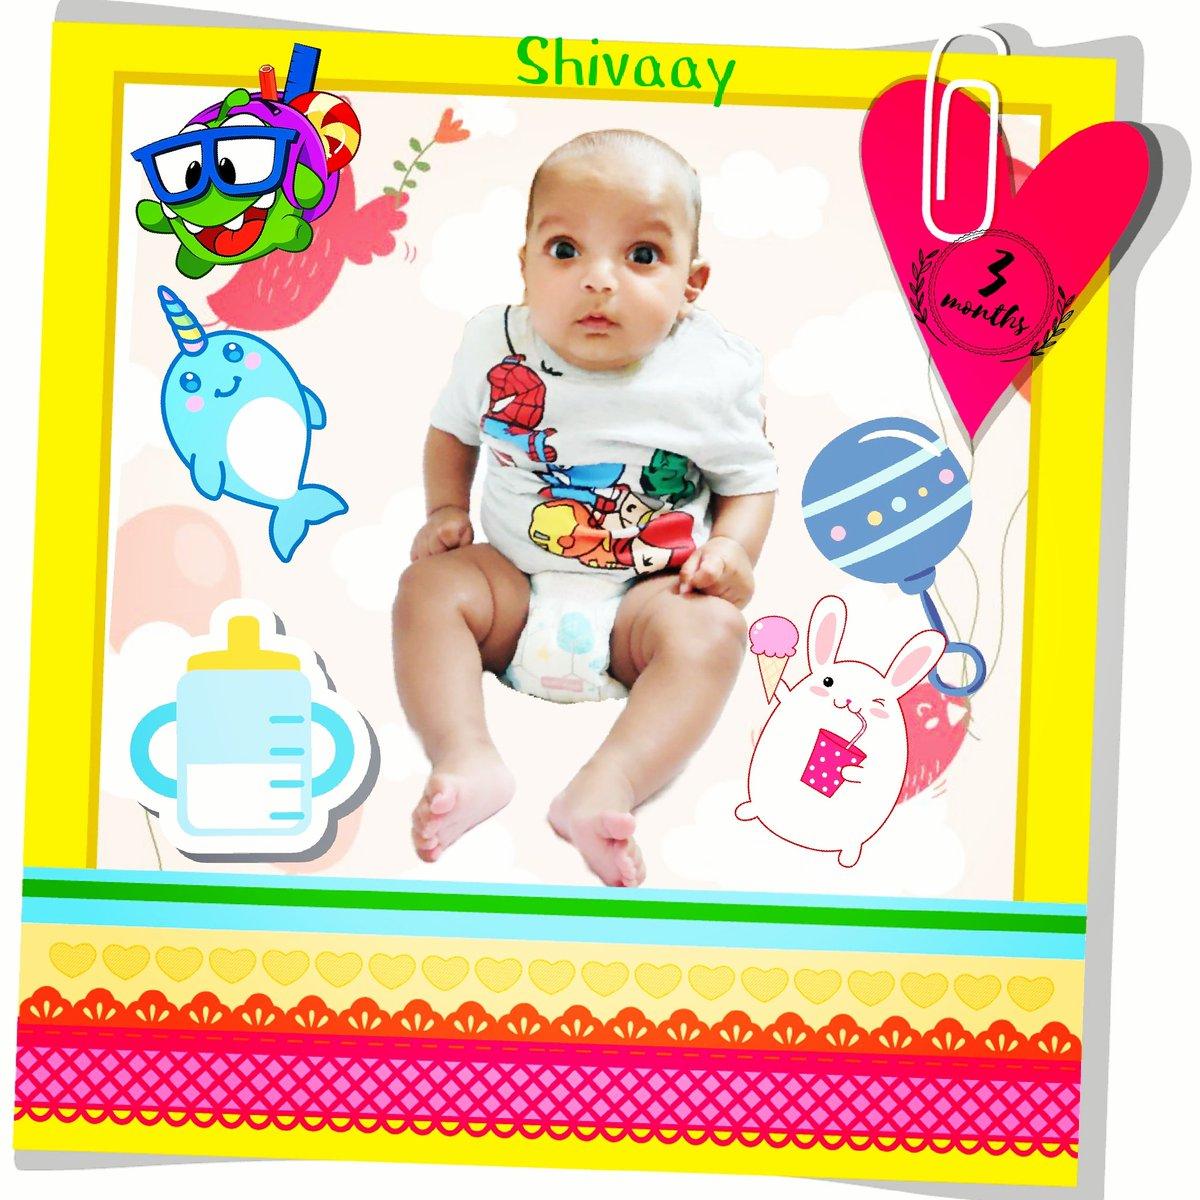 Hello I am 3 Months Old Now...   . .  #india #indianbaby #babyboyclothes #babyshower #mybaby #indianfood #babies #baby #indianphotography #cutedog #babyboys #babyboy#babiesofinstagram #babygirl #babyboystyle #babylove #babyboy #cutebaby #pregnancy #cutepic.twitter.com/yDkexLfov3